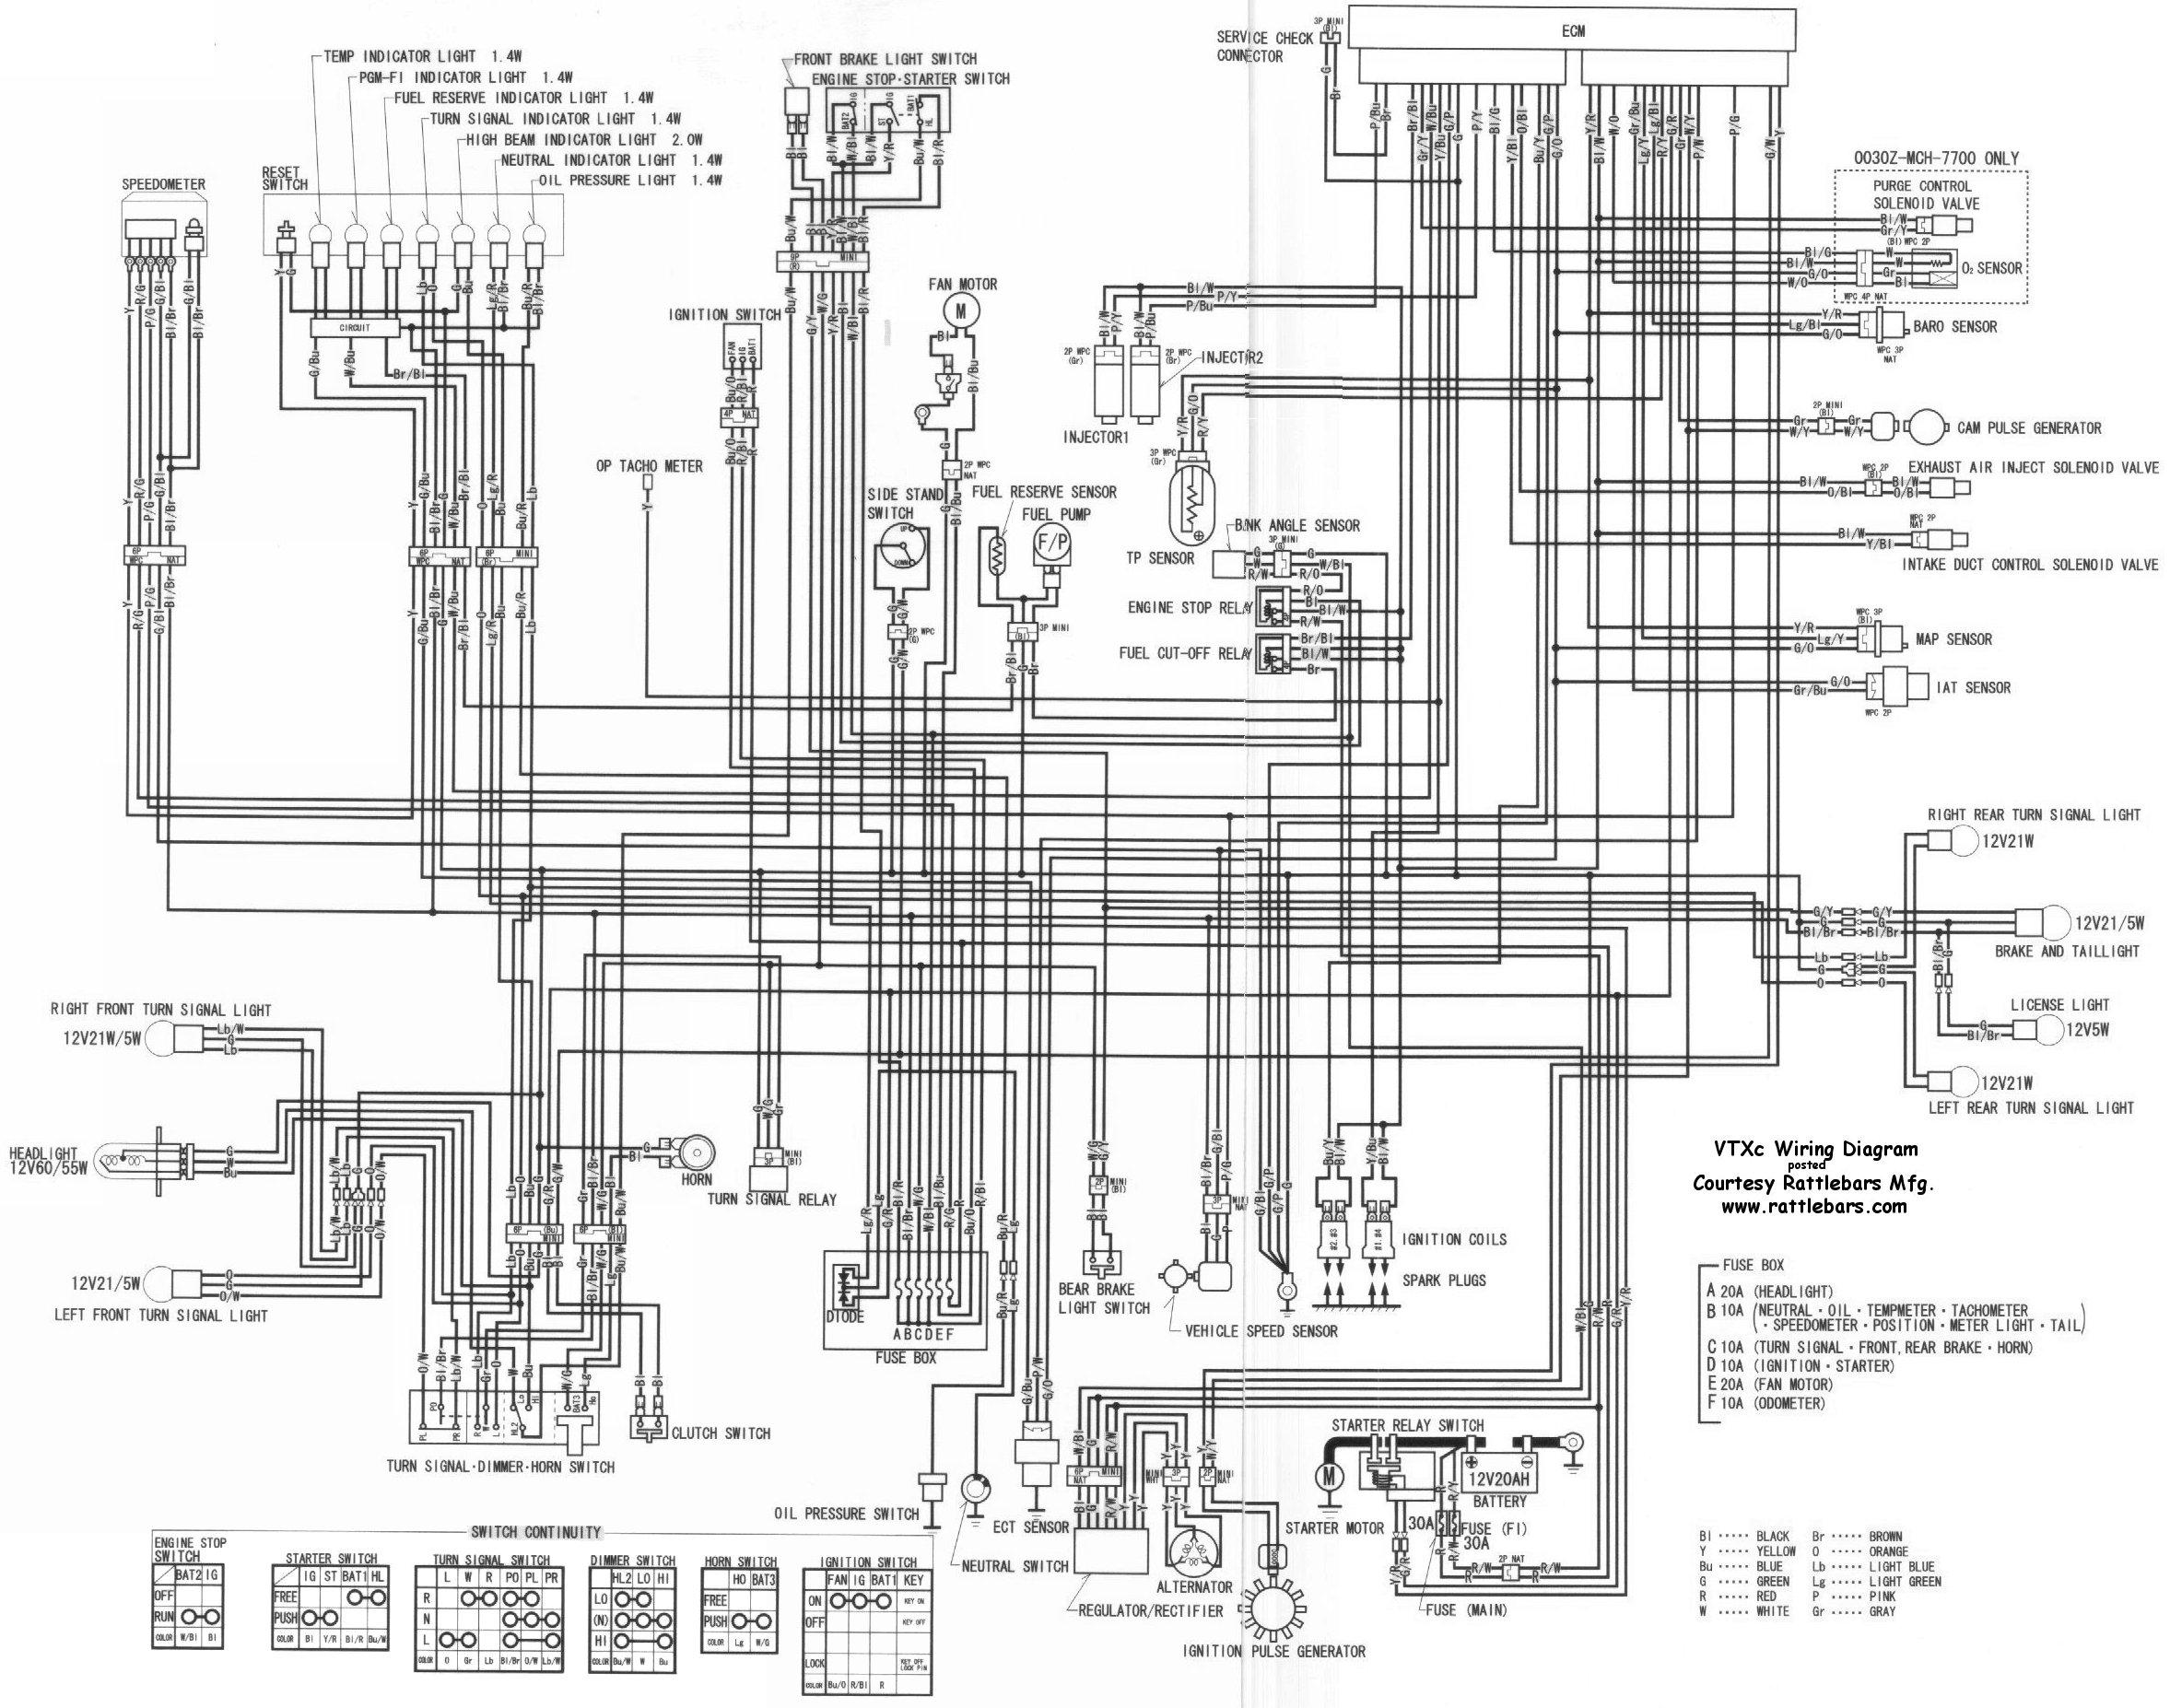 2005 vtx wiring diagram